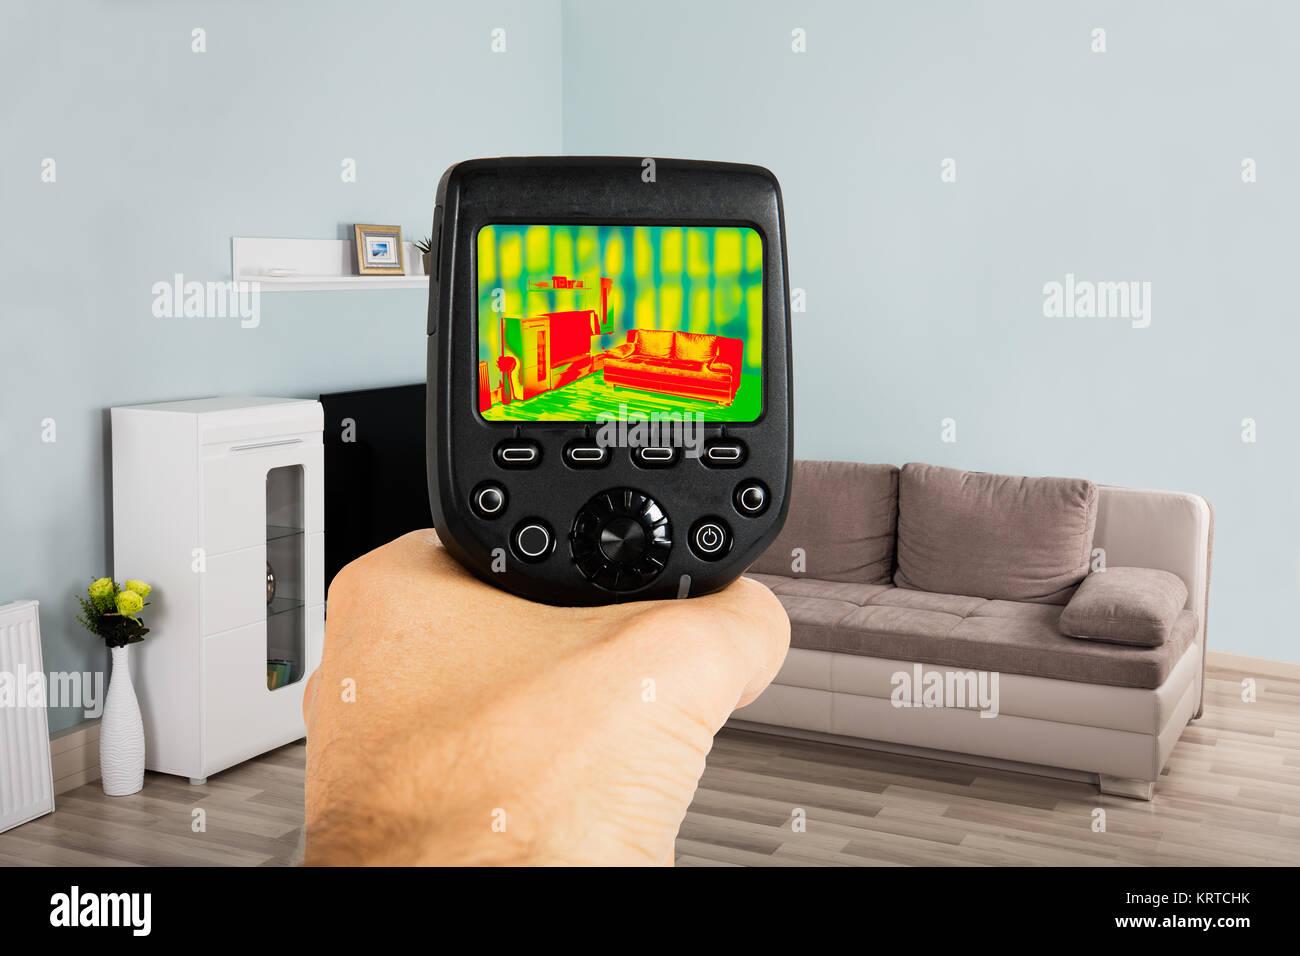 Thermal camera stockfotos thermal camera bilder alamy for Fliegen lebensdauer